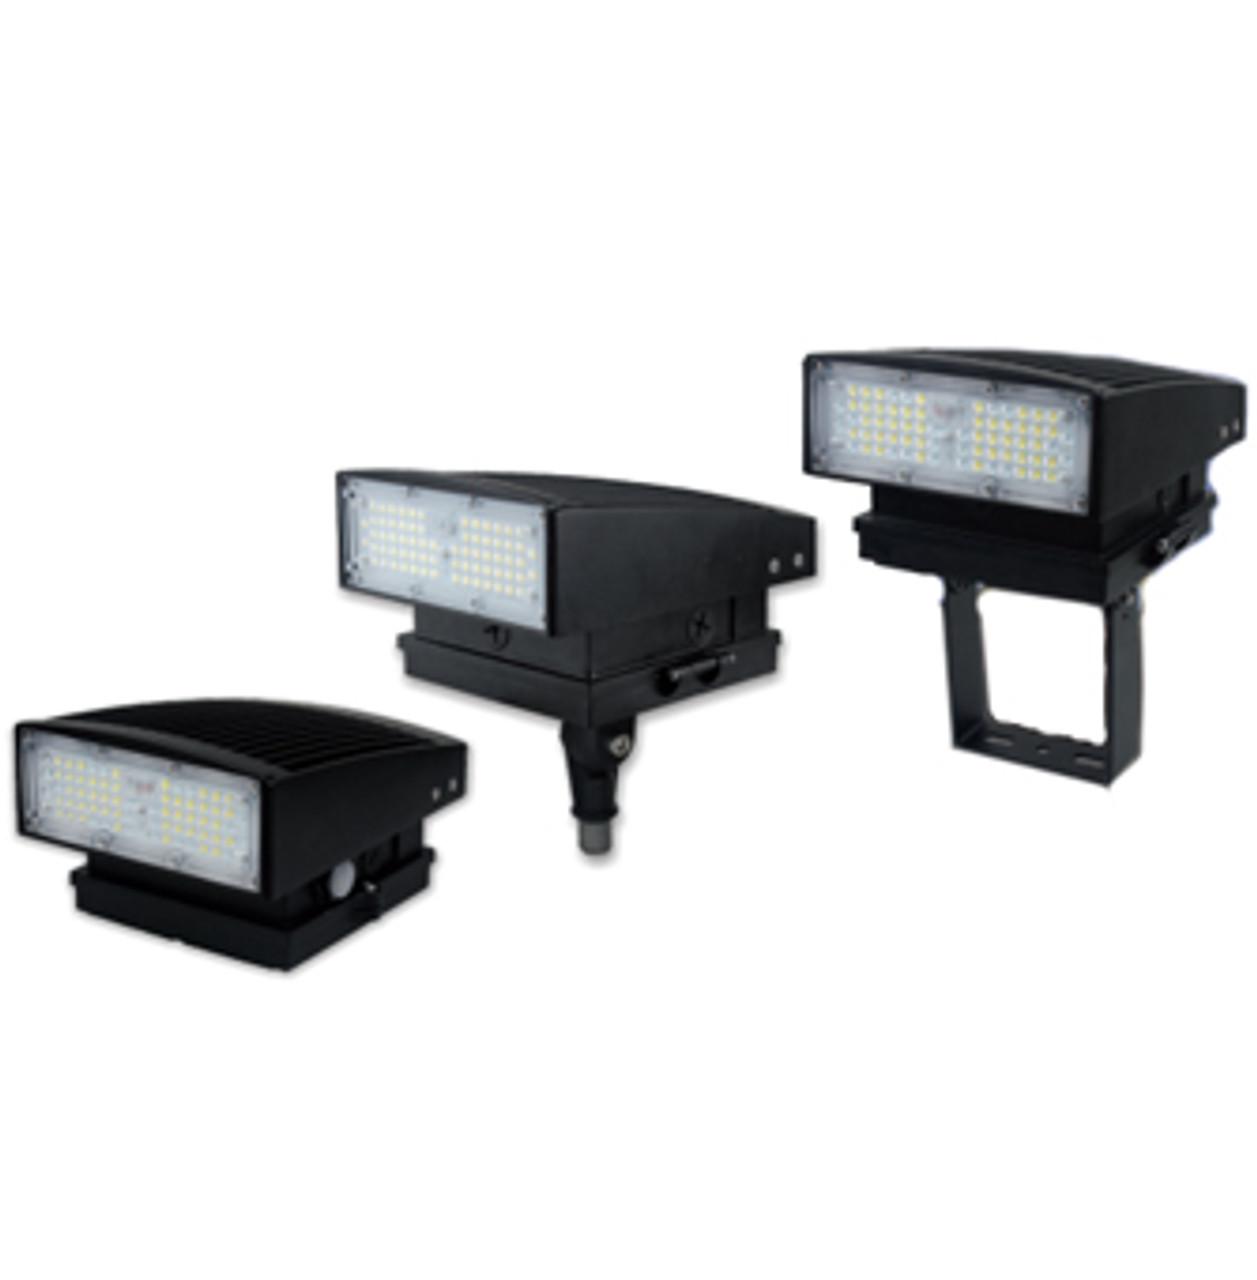 LED Wall Pack 55 Watt - 200W HPS/MH Equivalent